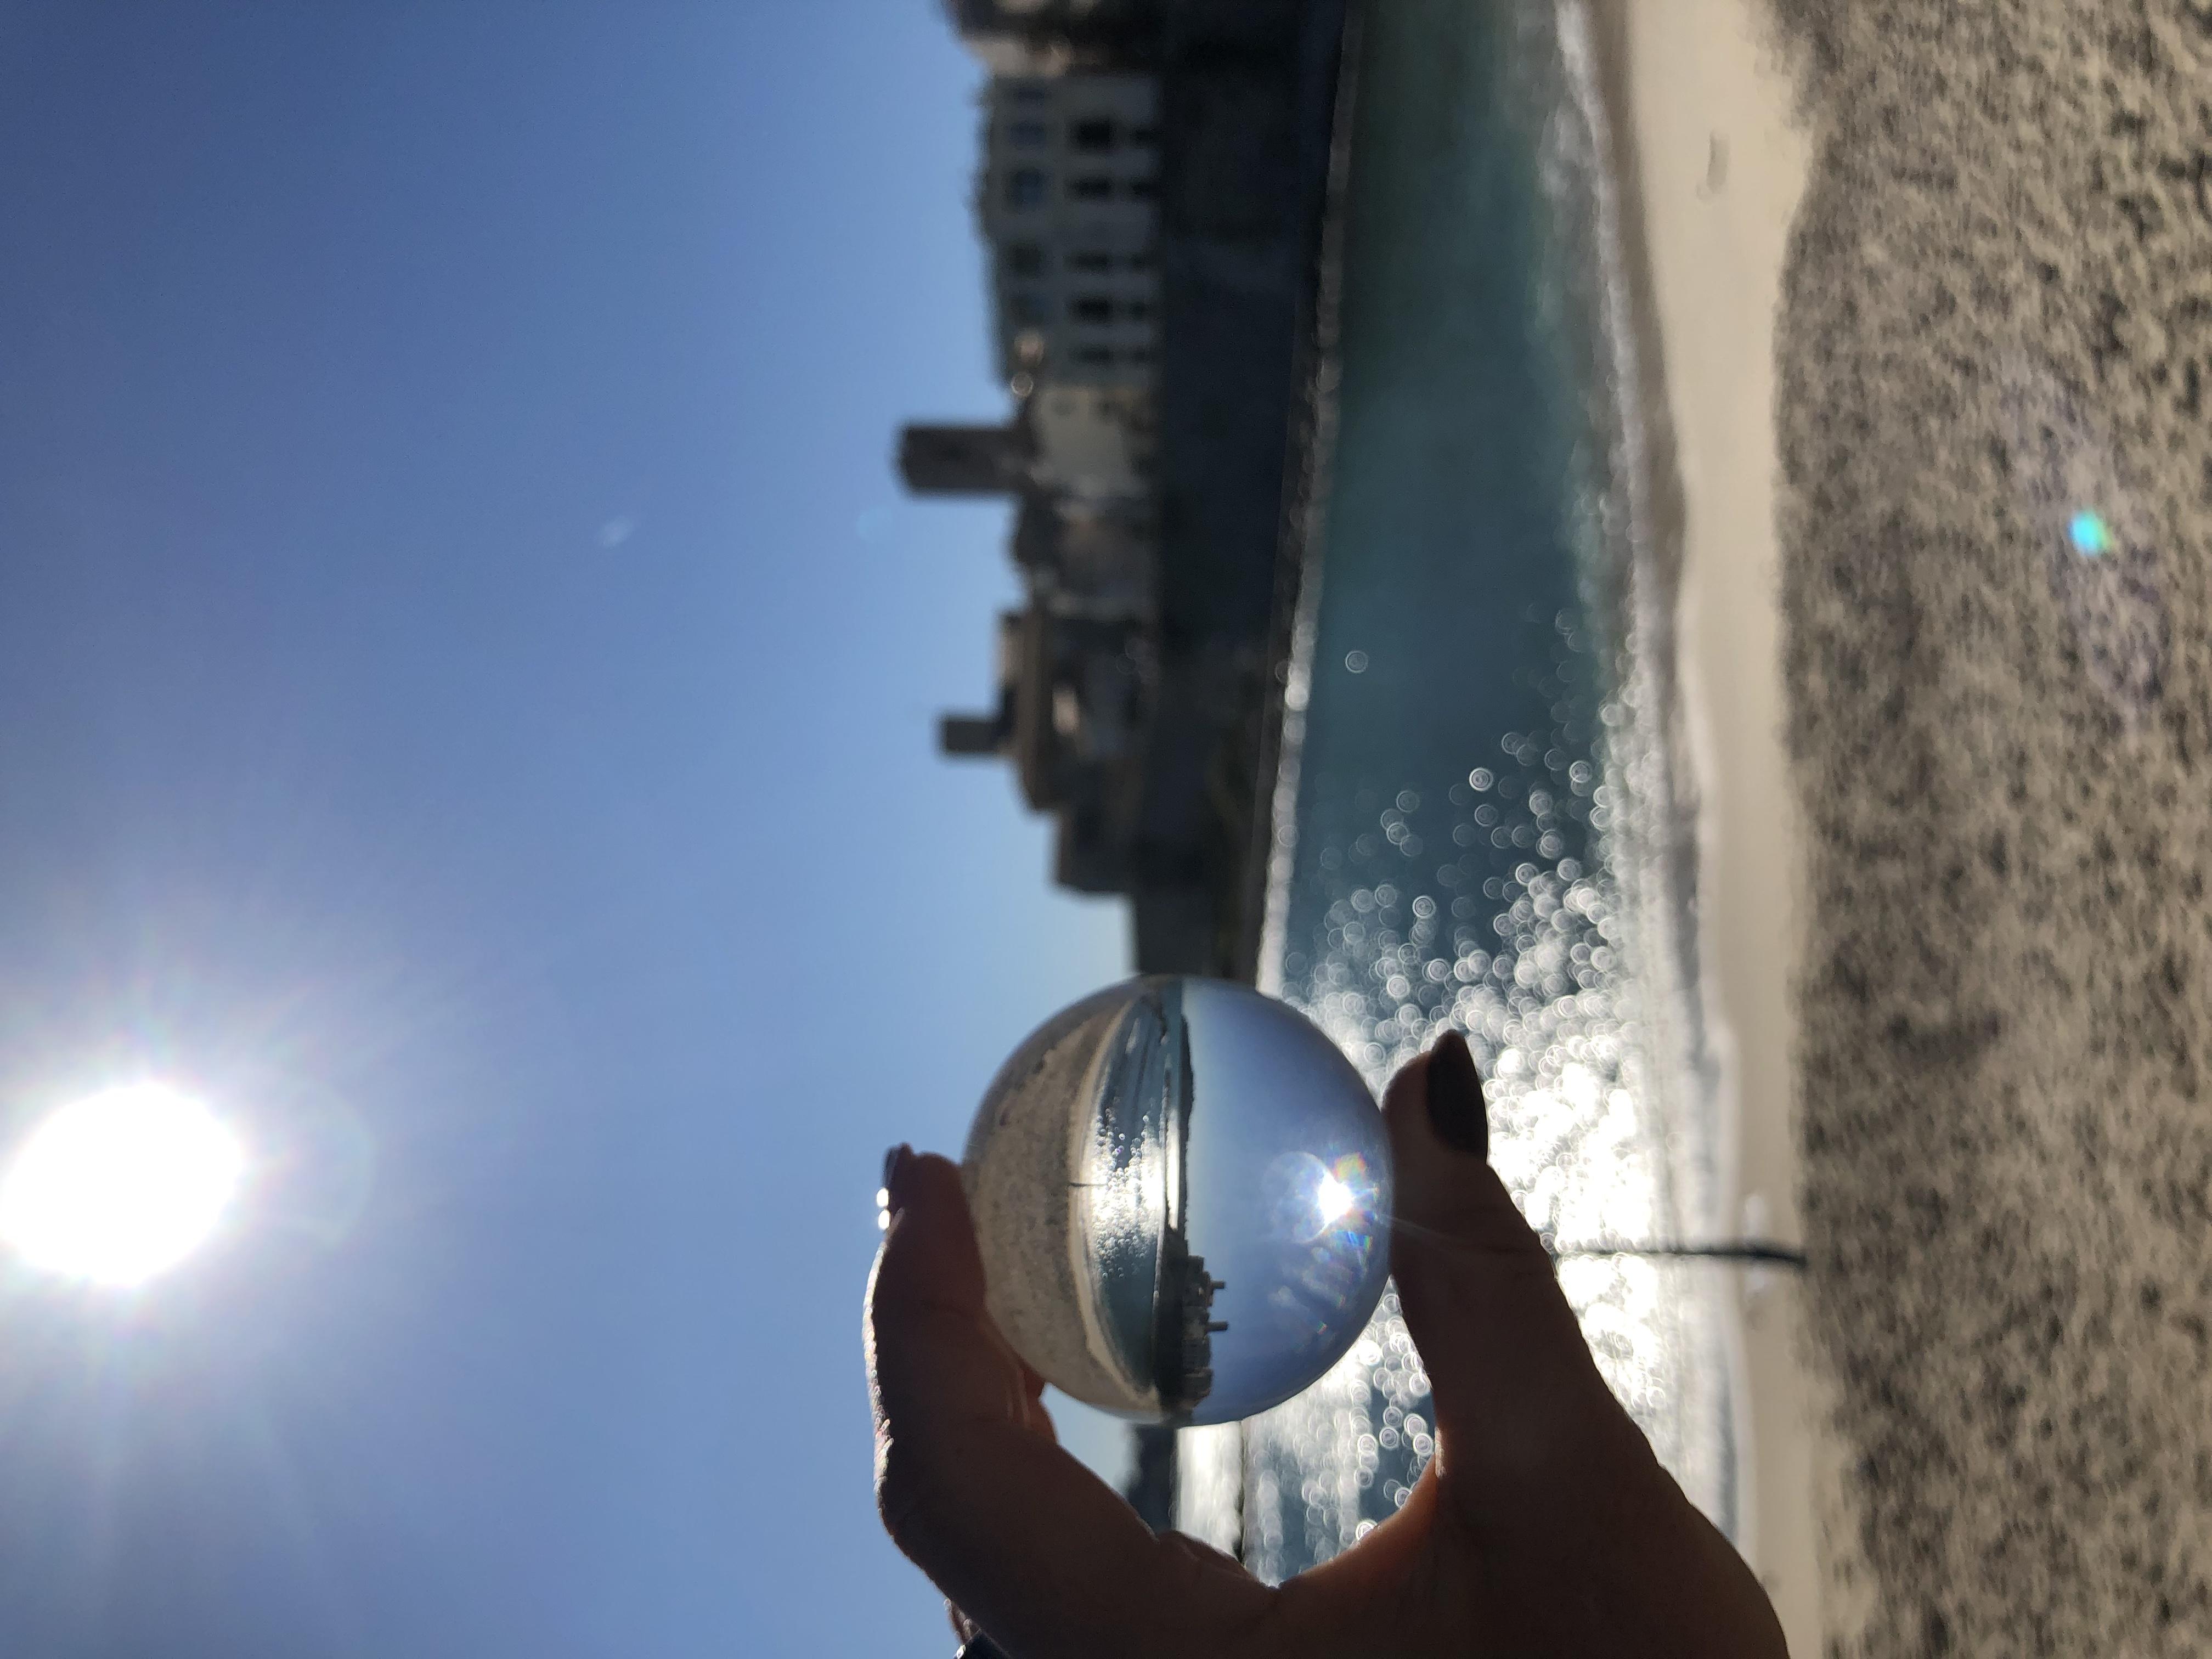 France bleu, Marseille, WAT19, Abarth… Les états d'esprit du vendredi 08/02/2019